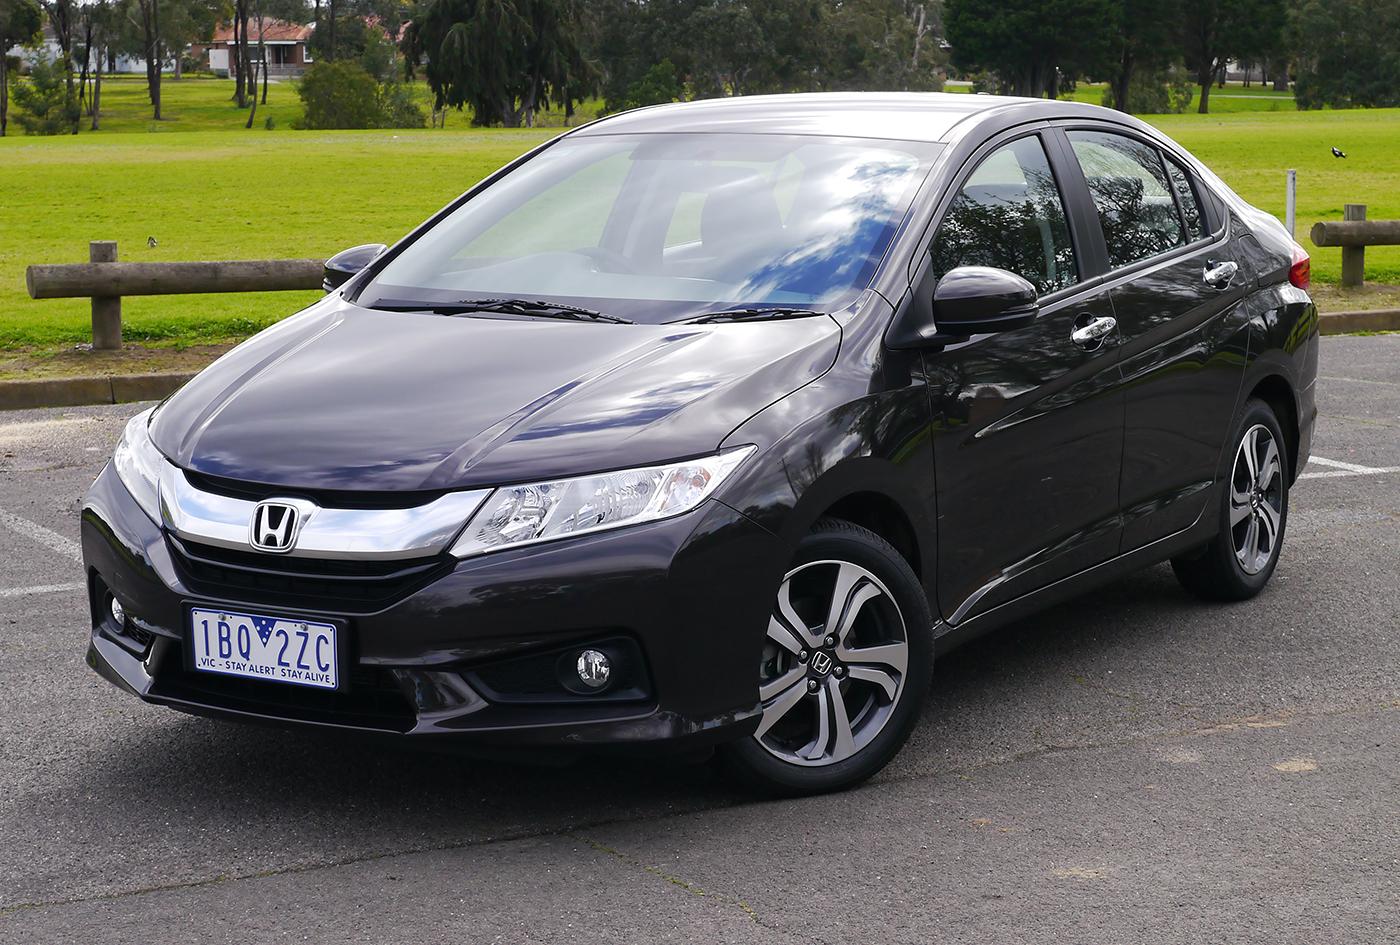 Honda City Review: 2014 VTi-L Automatic